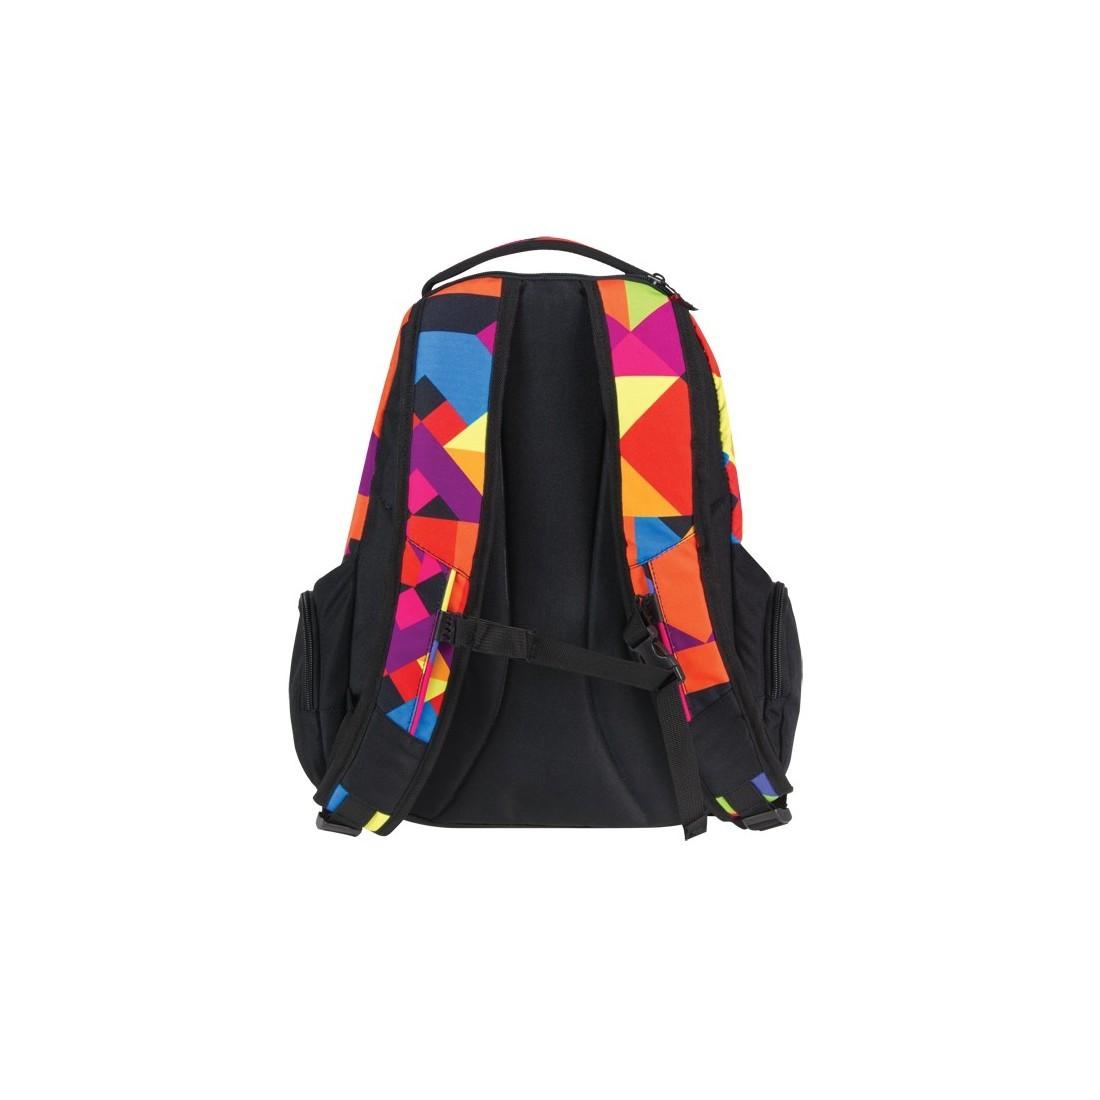 Plecak młodzieżowy duży MTV Coolpack Colors - plecak-tornister.pl